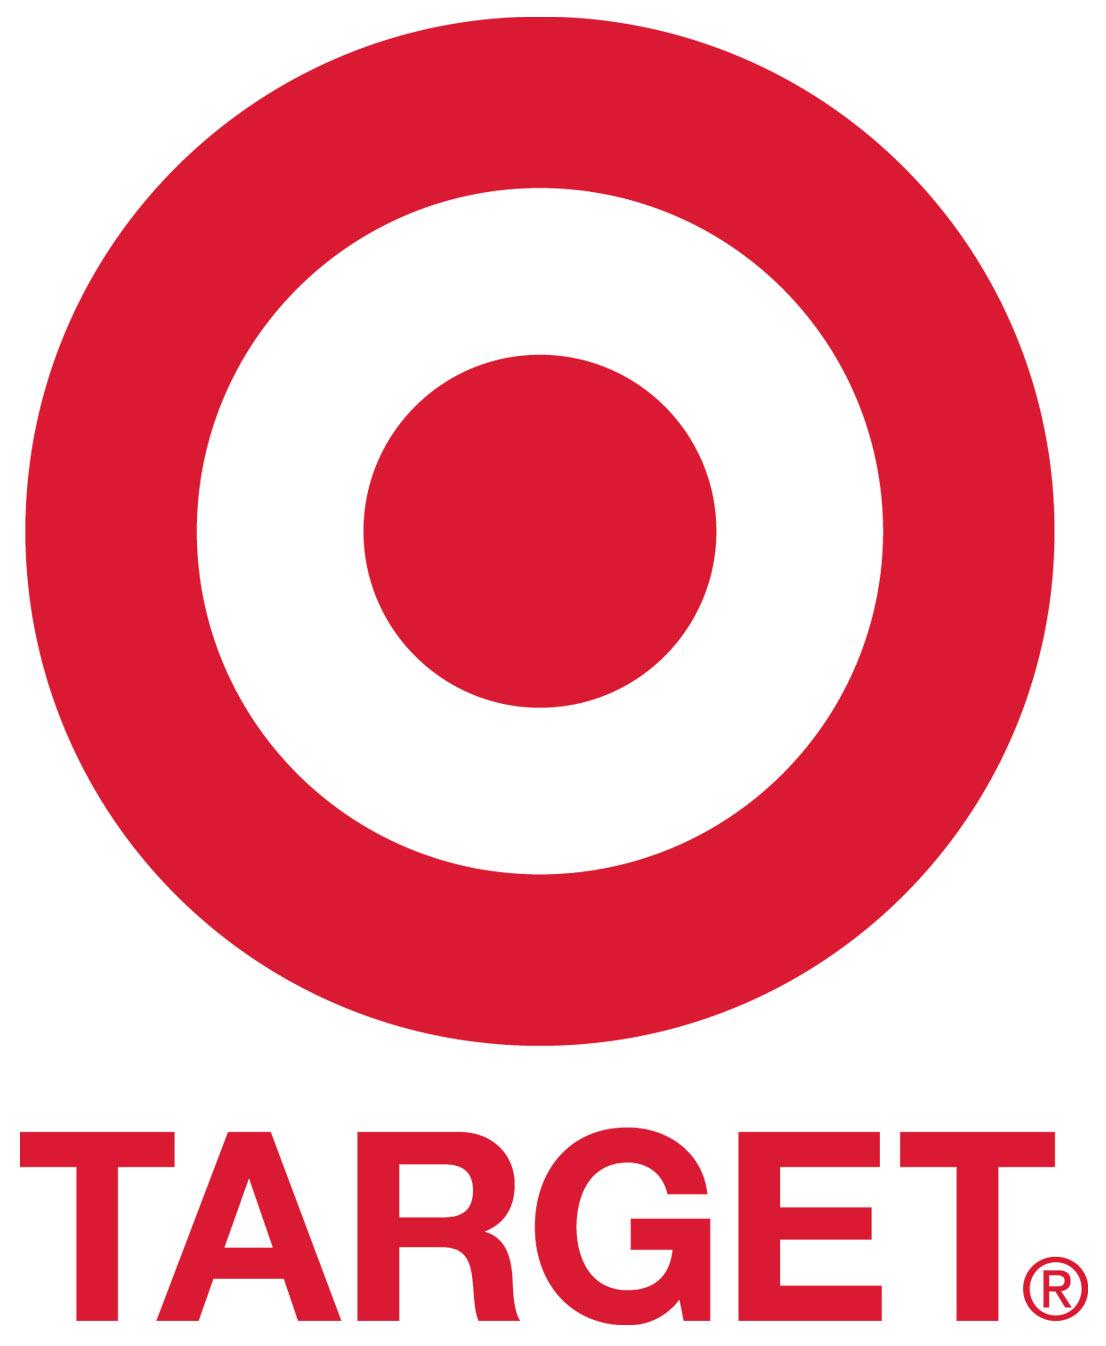 Target dividend stock analysis (TGT)